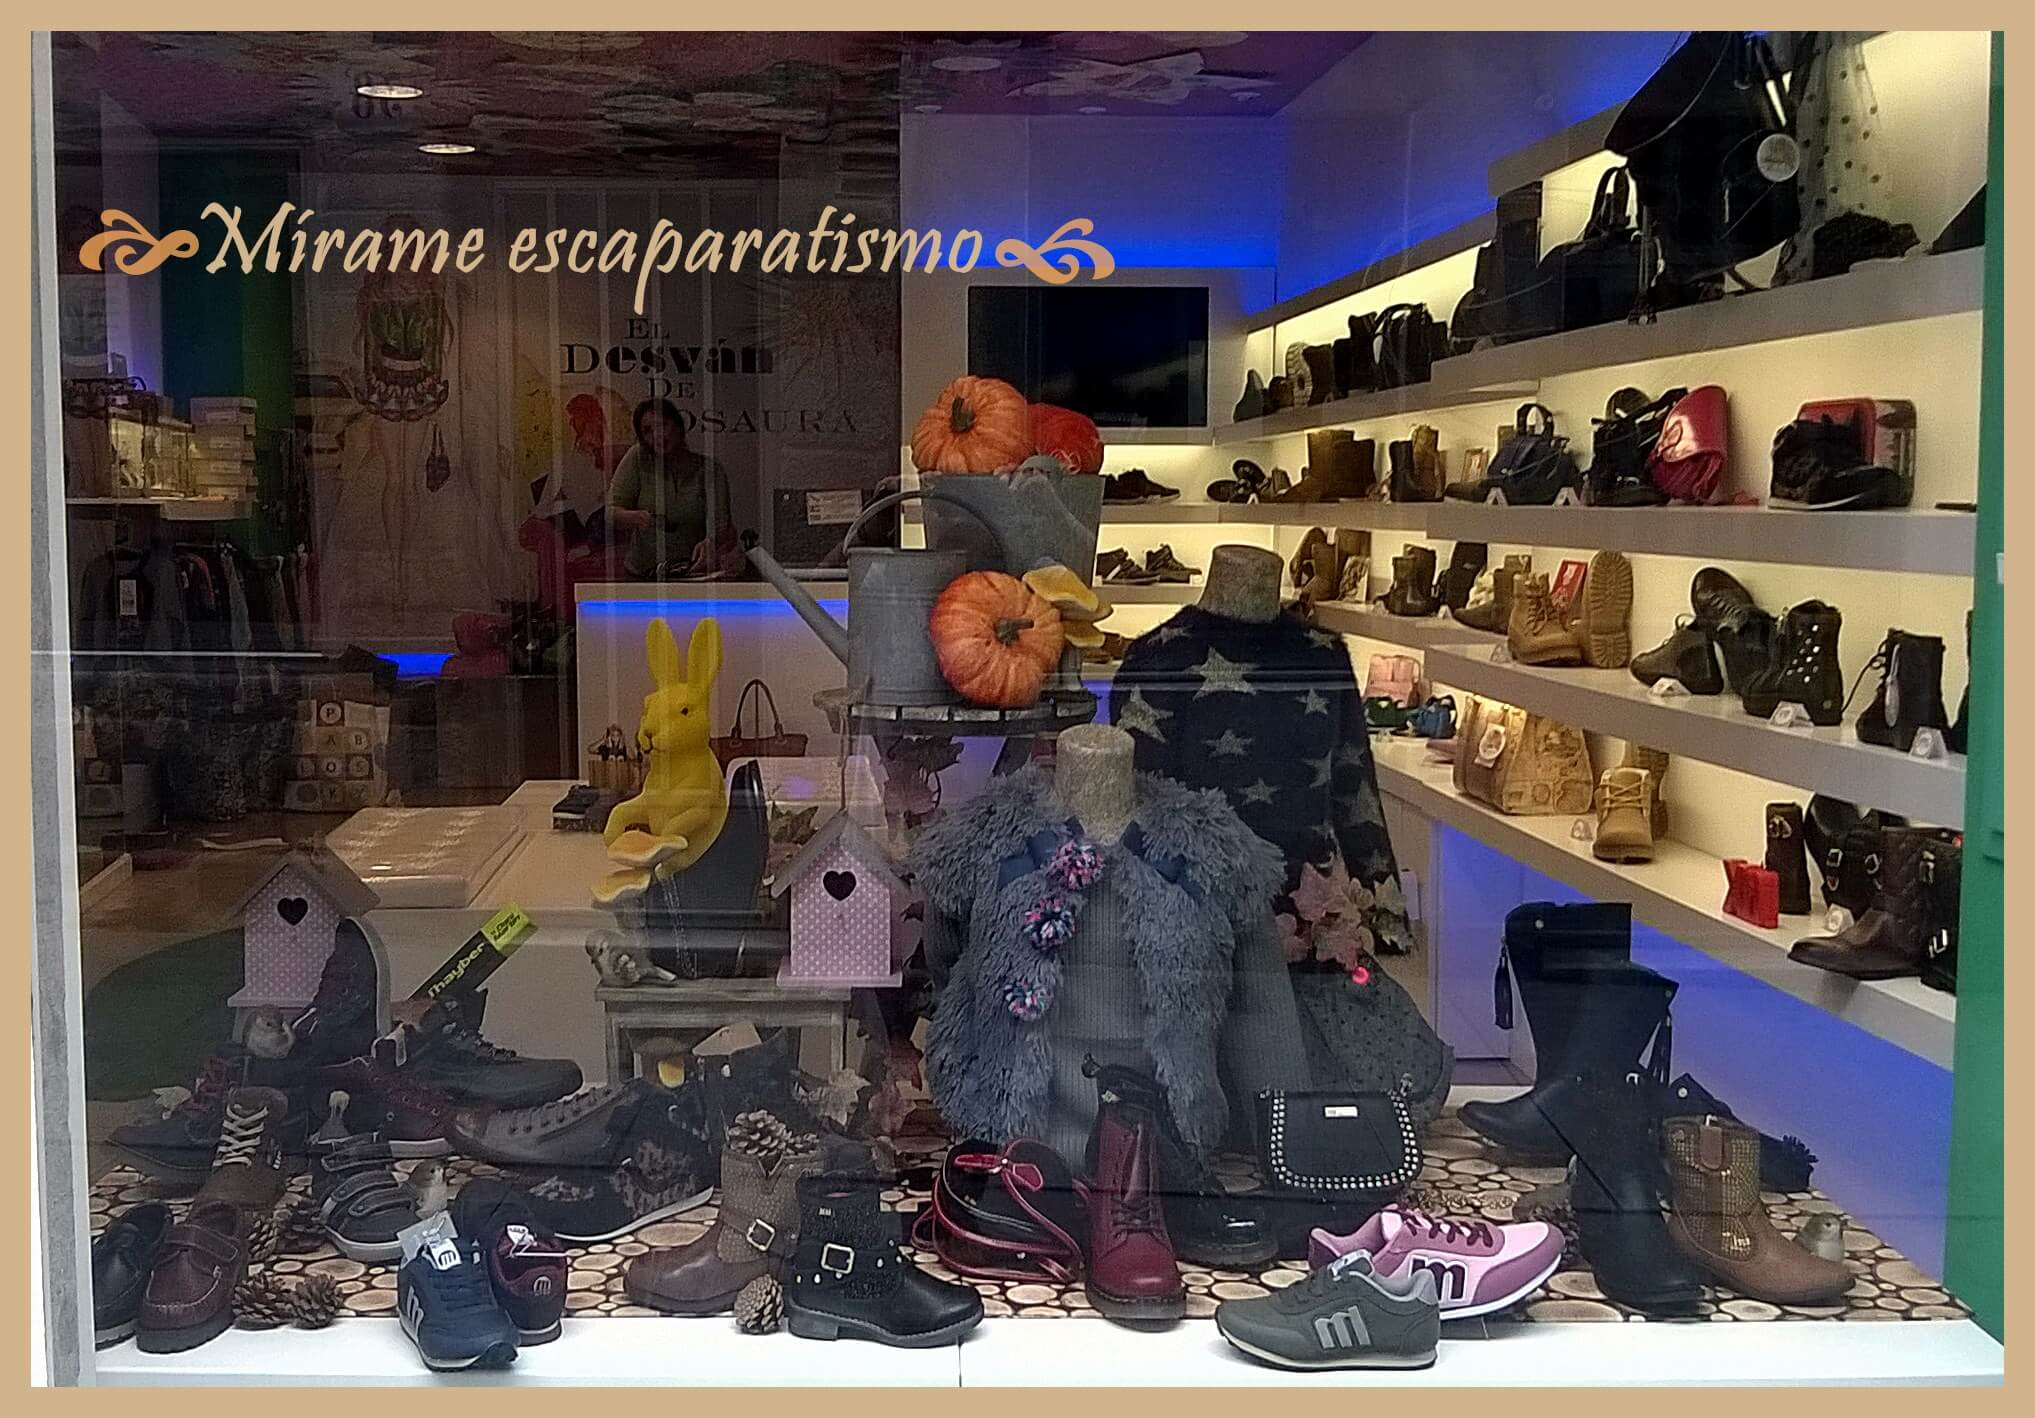 Decoracion Zapateria Infantil ~ Escaparate oto?o en zapateria infantil y juvenil por M?rame